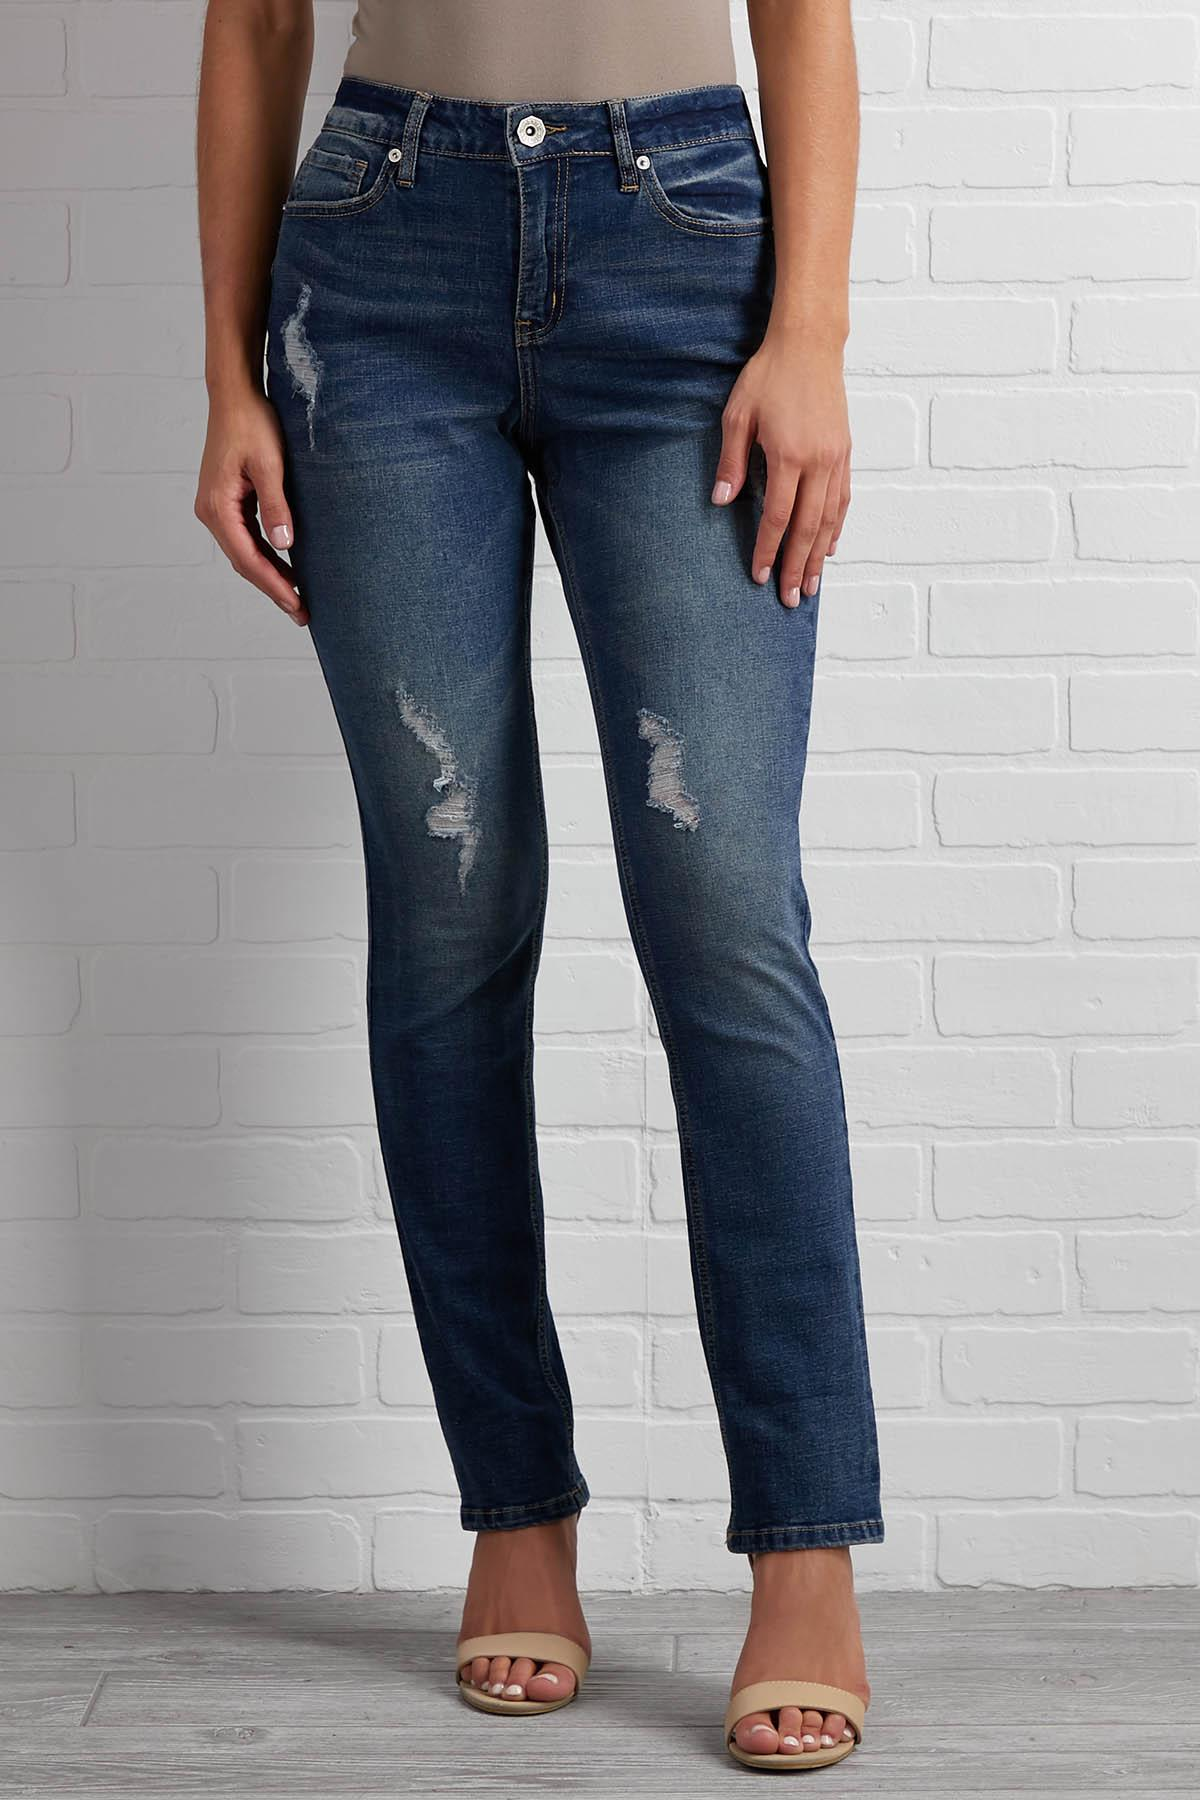 Set The Story Straight Leg Jeans